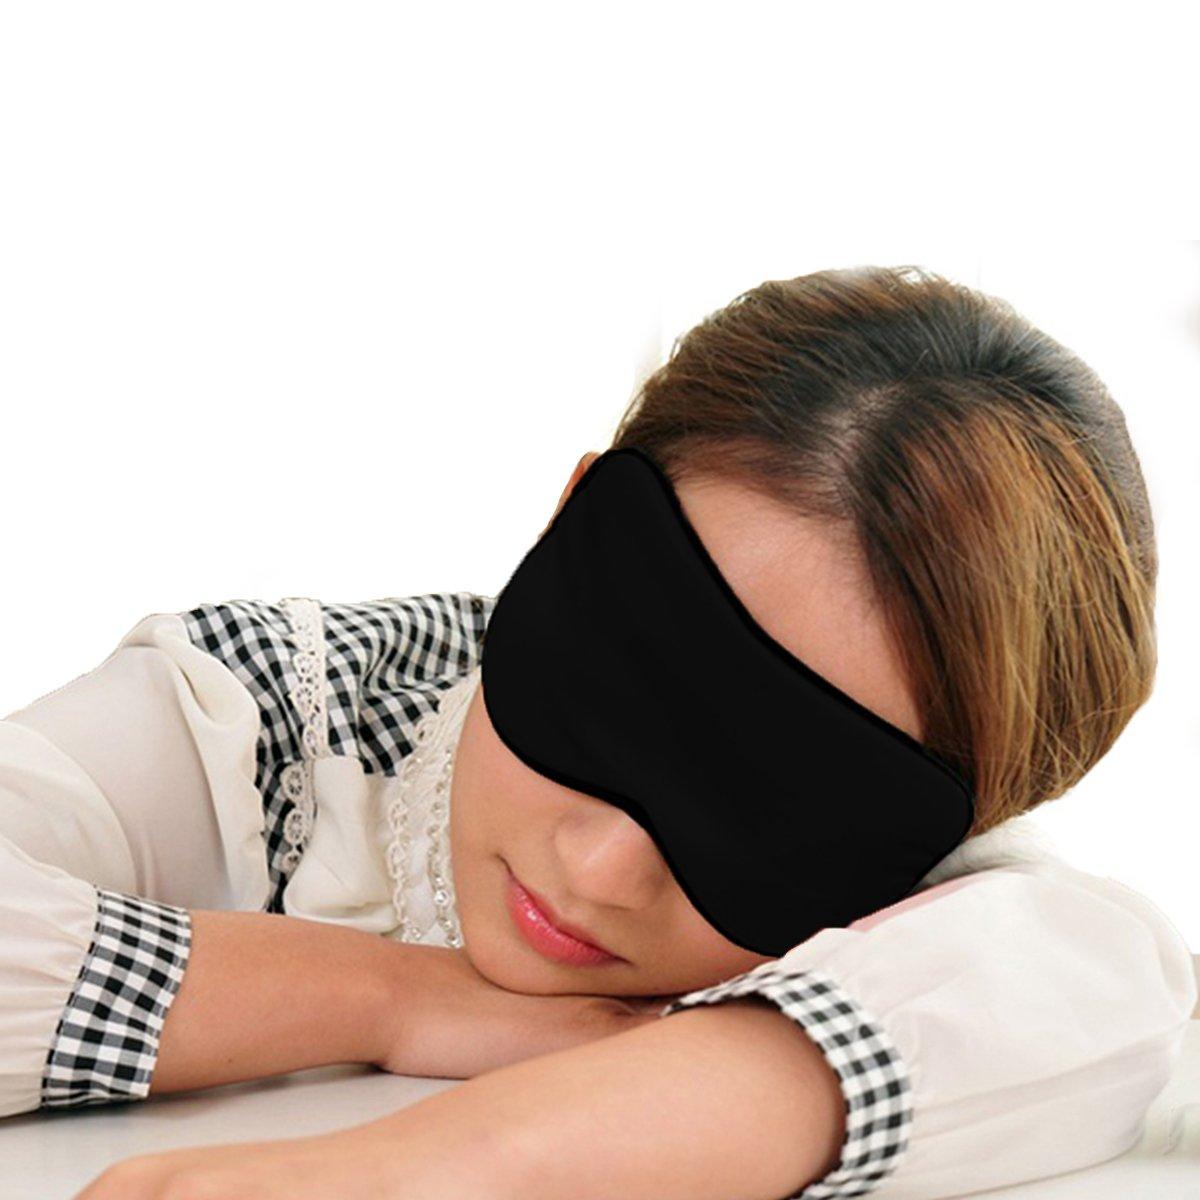 PROTAGE 天使の シルク アイマスク 天然シルクの究極の肌触り 睡眠 の 質 を 高める 快眠 グッズ 旅行 昼寝 に オススメ